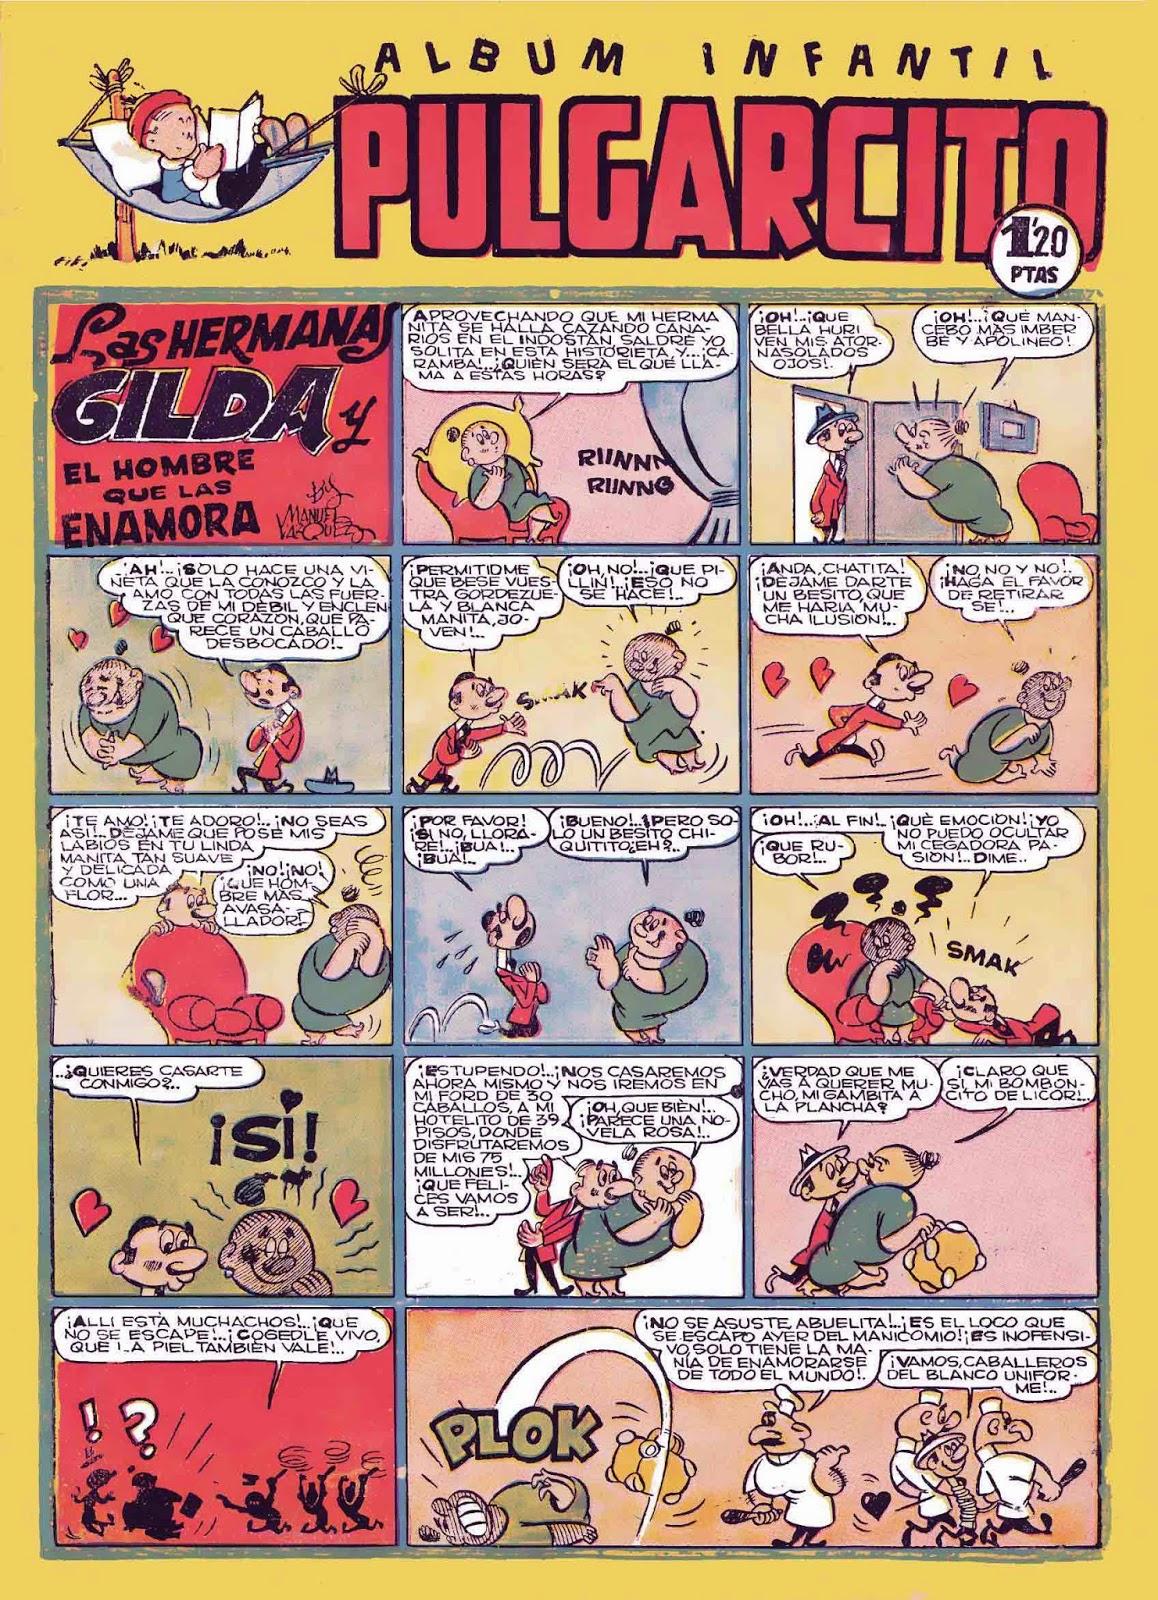 Las hermanas Gilda, Pulgarcito nº 125